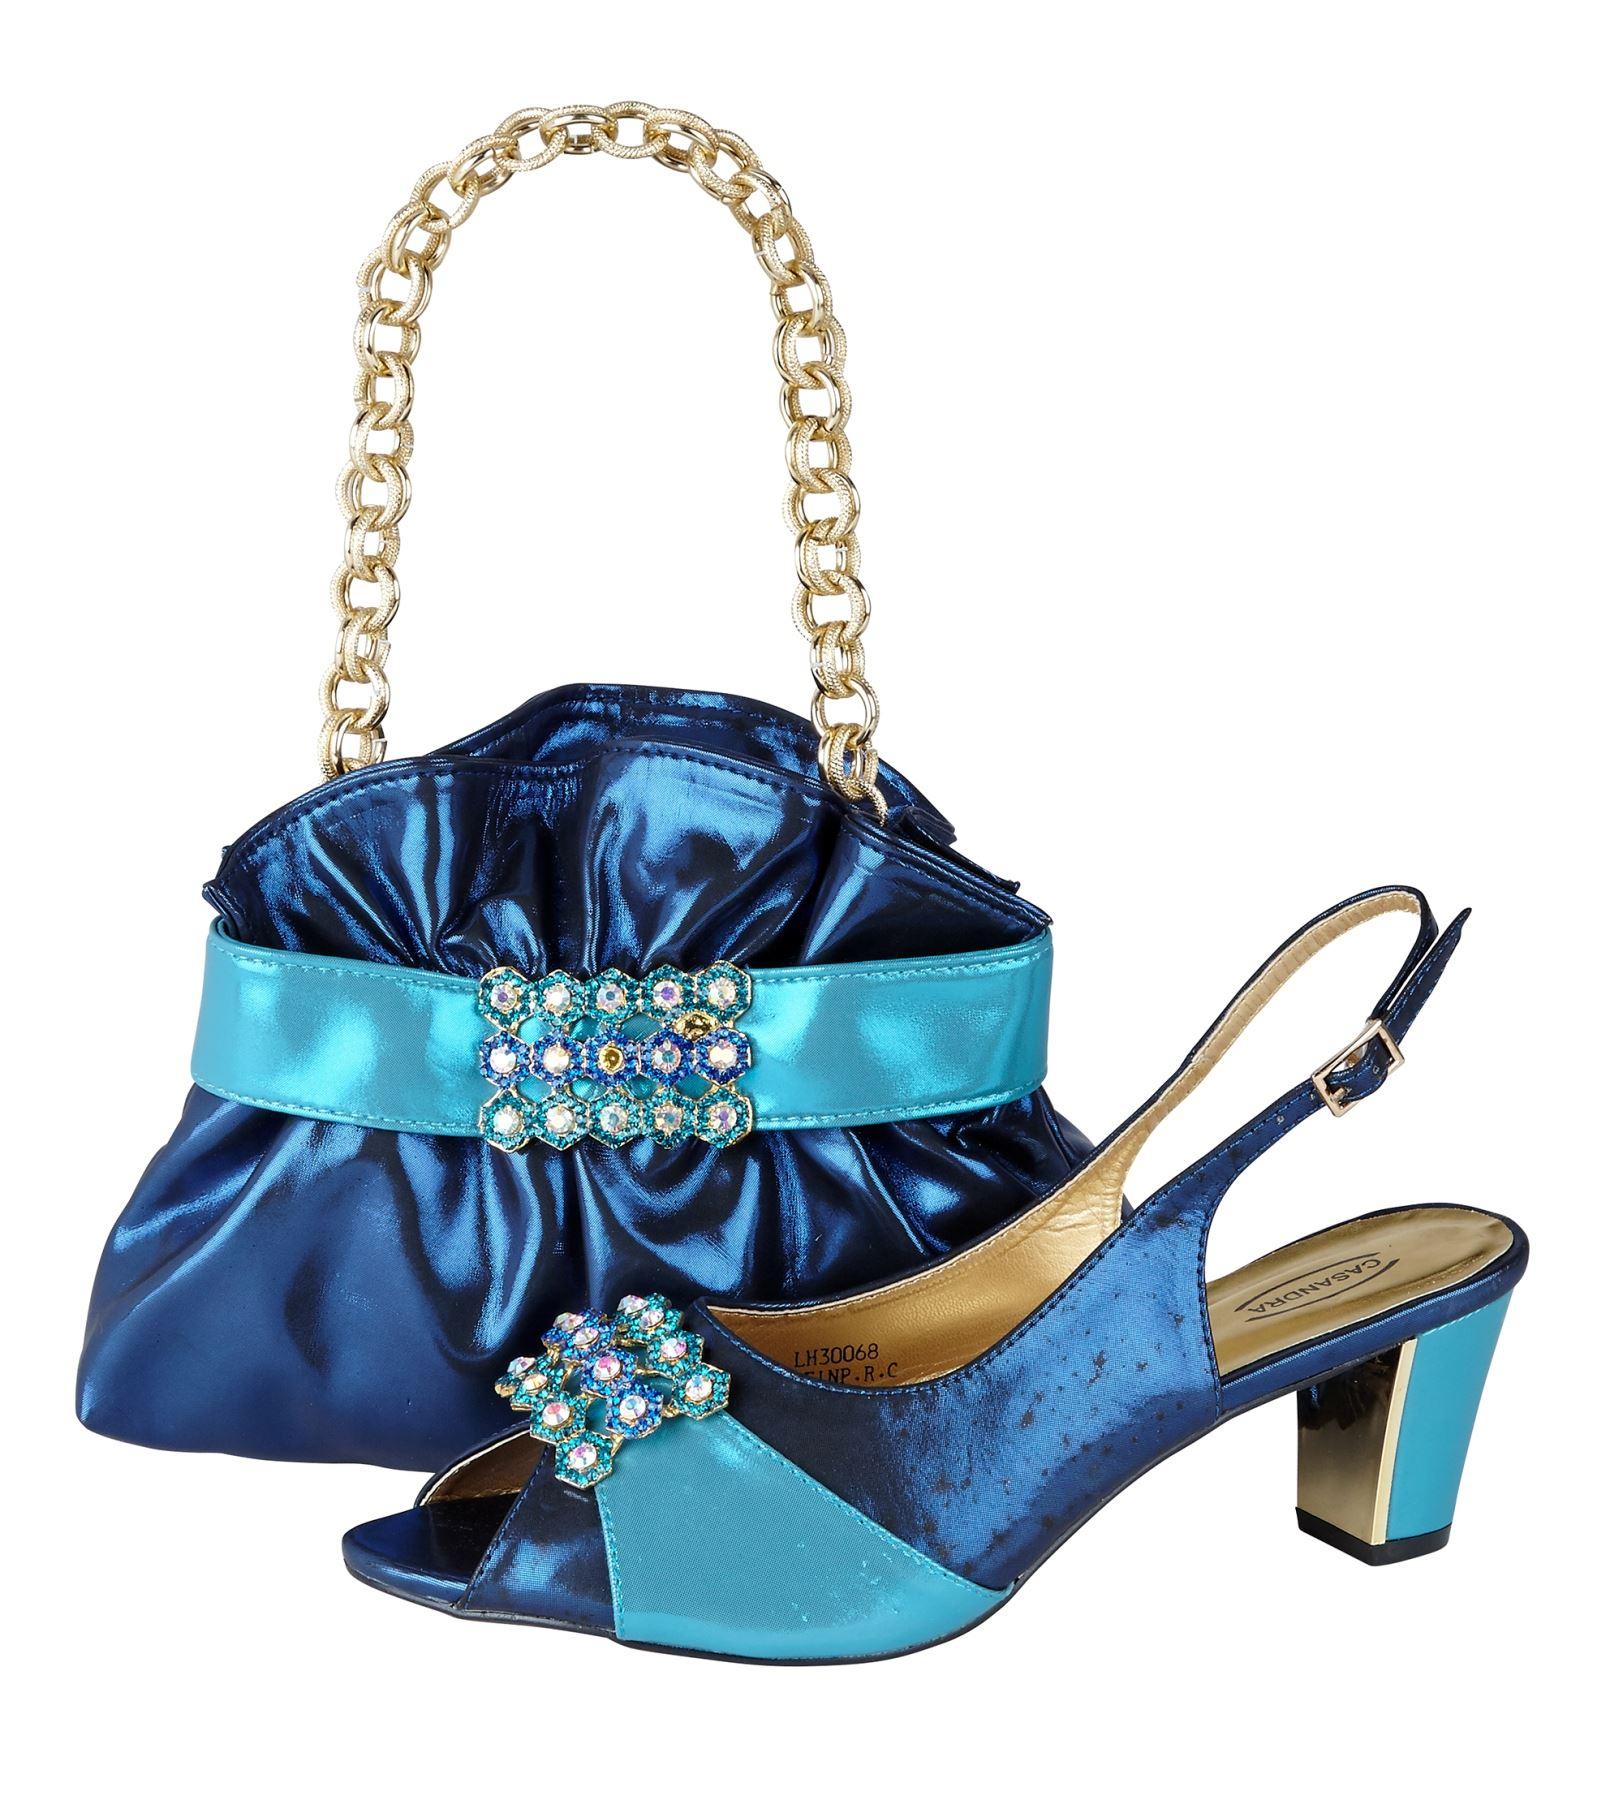 E Bay Matching Shoes Bags Size